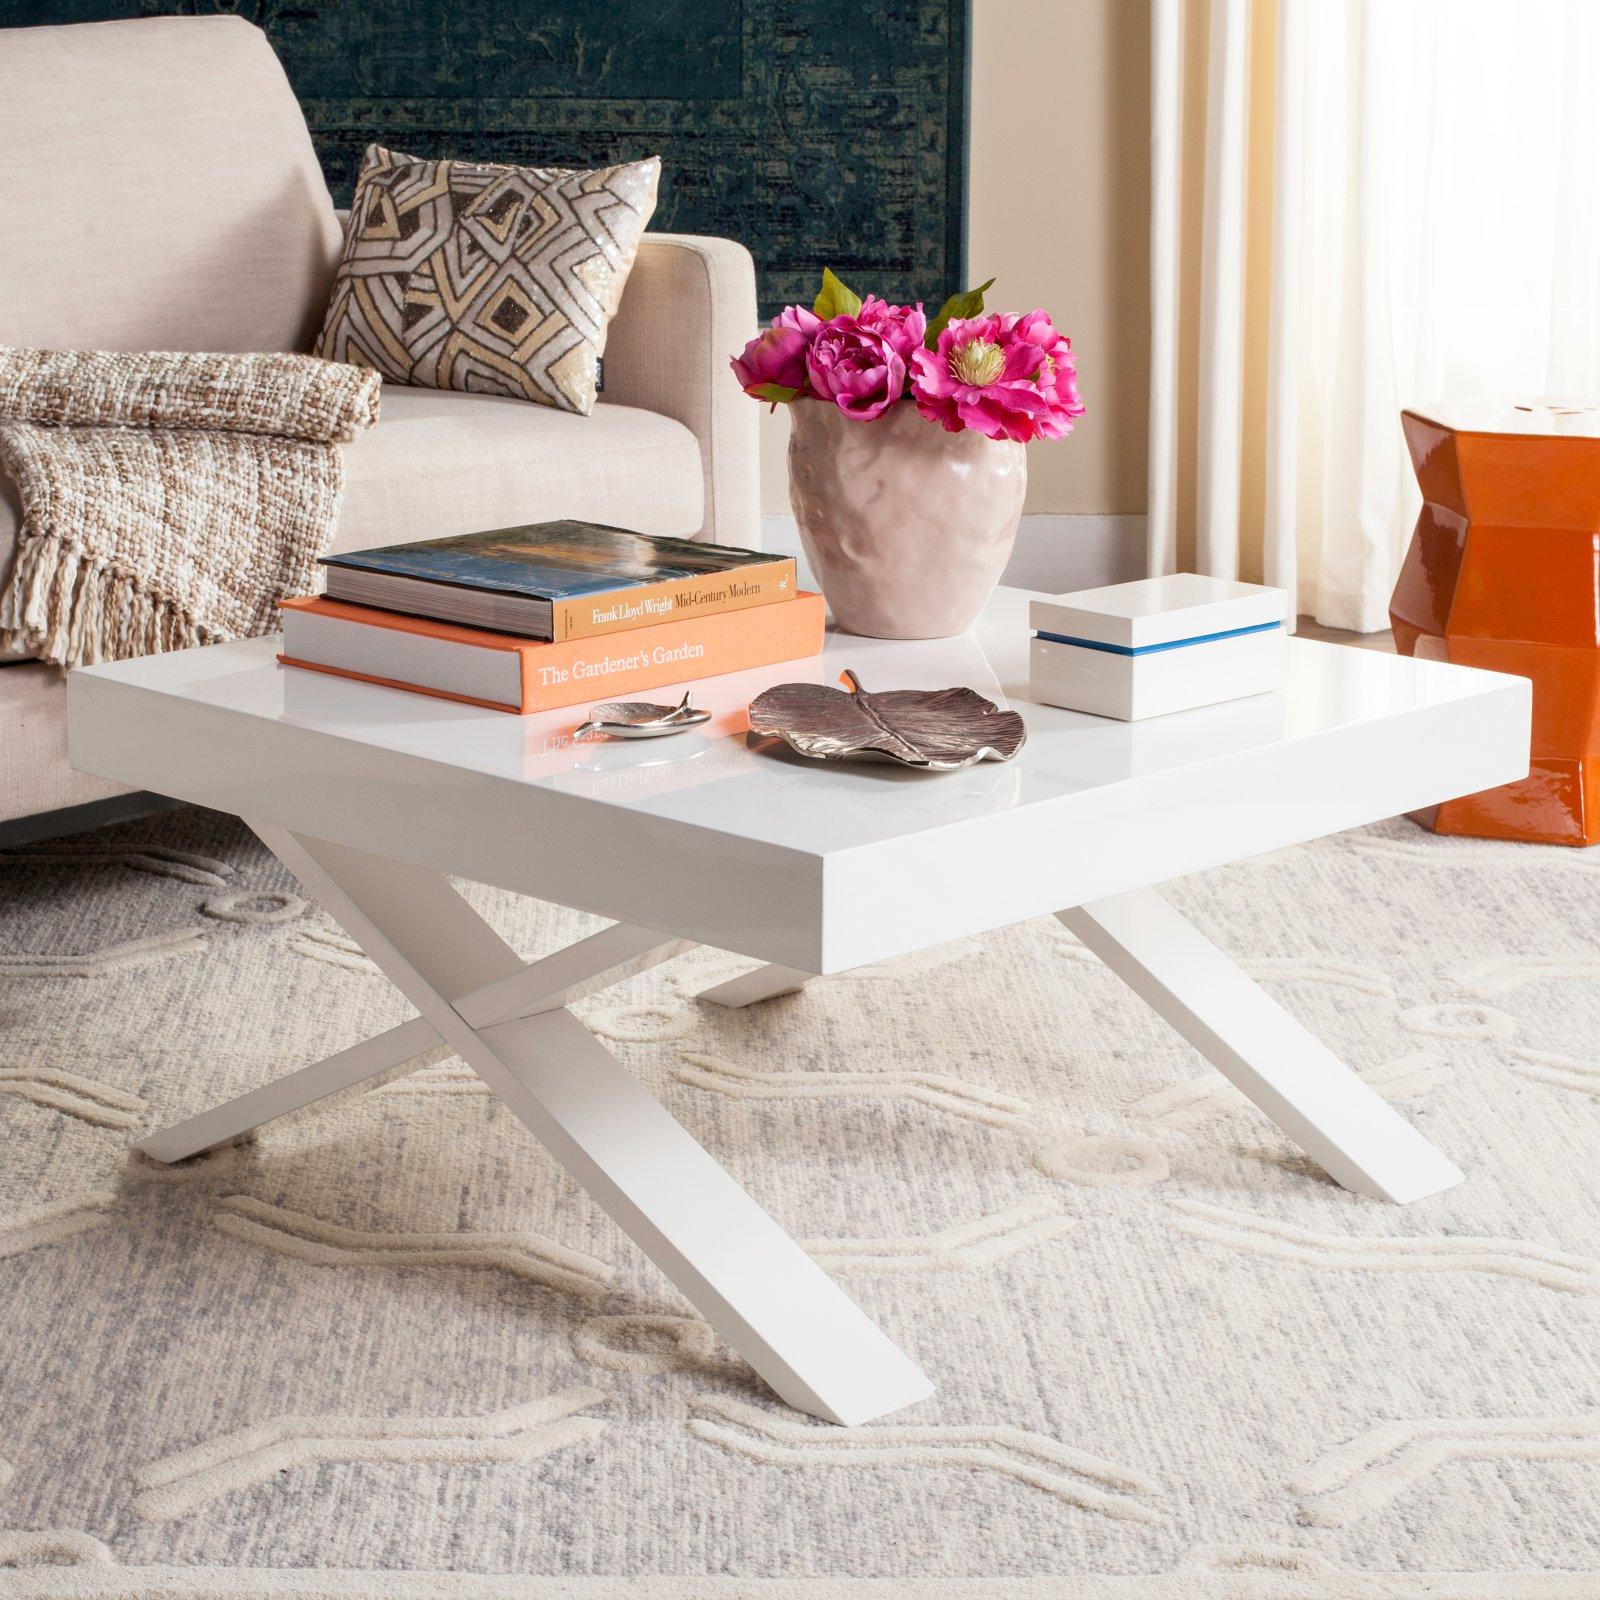 "Safavieh Harrison 31.5"" Square Mid Century Scandinavian Lacquer Coffee Table, White"